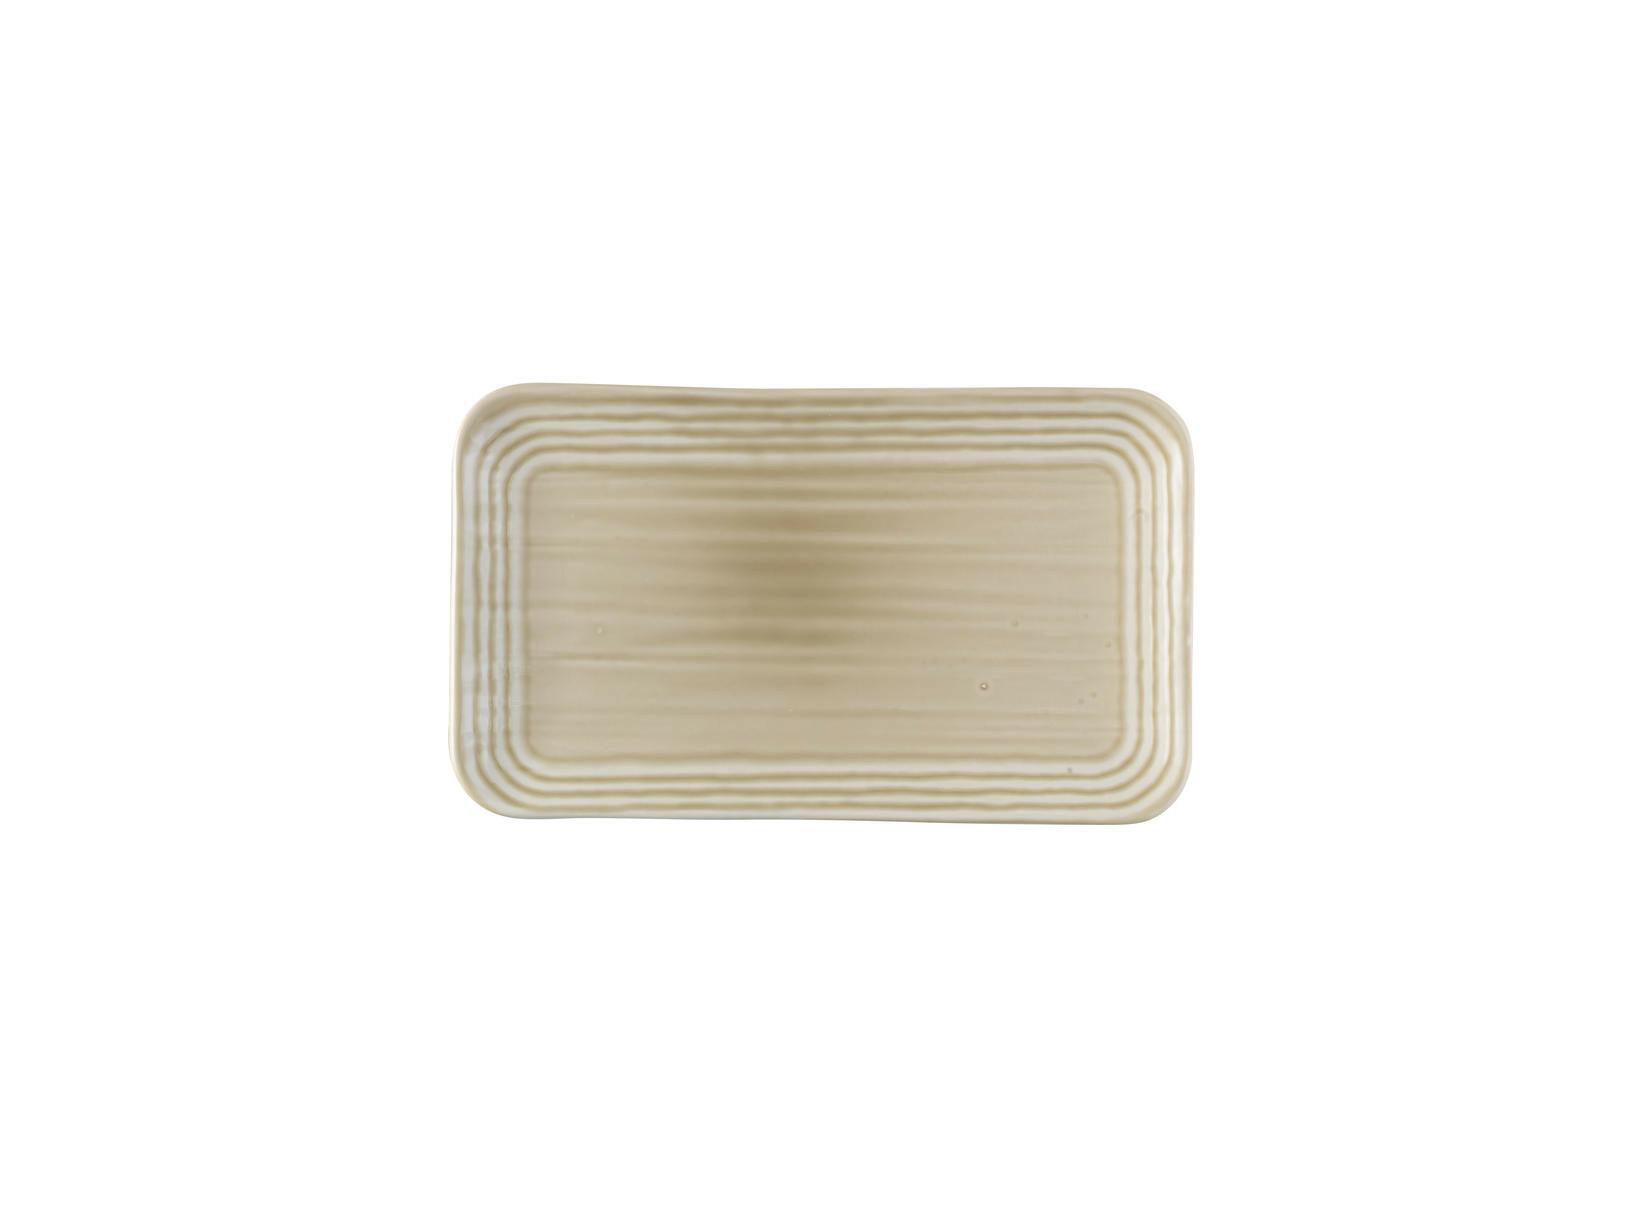 Dudson Harvest Norse Linen organic rectangular plate 27 x 16 cm